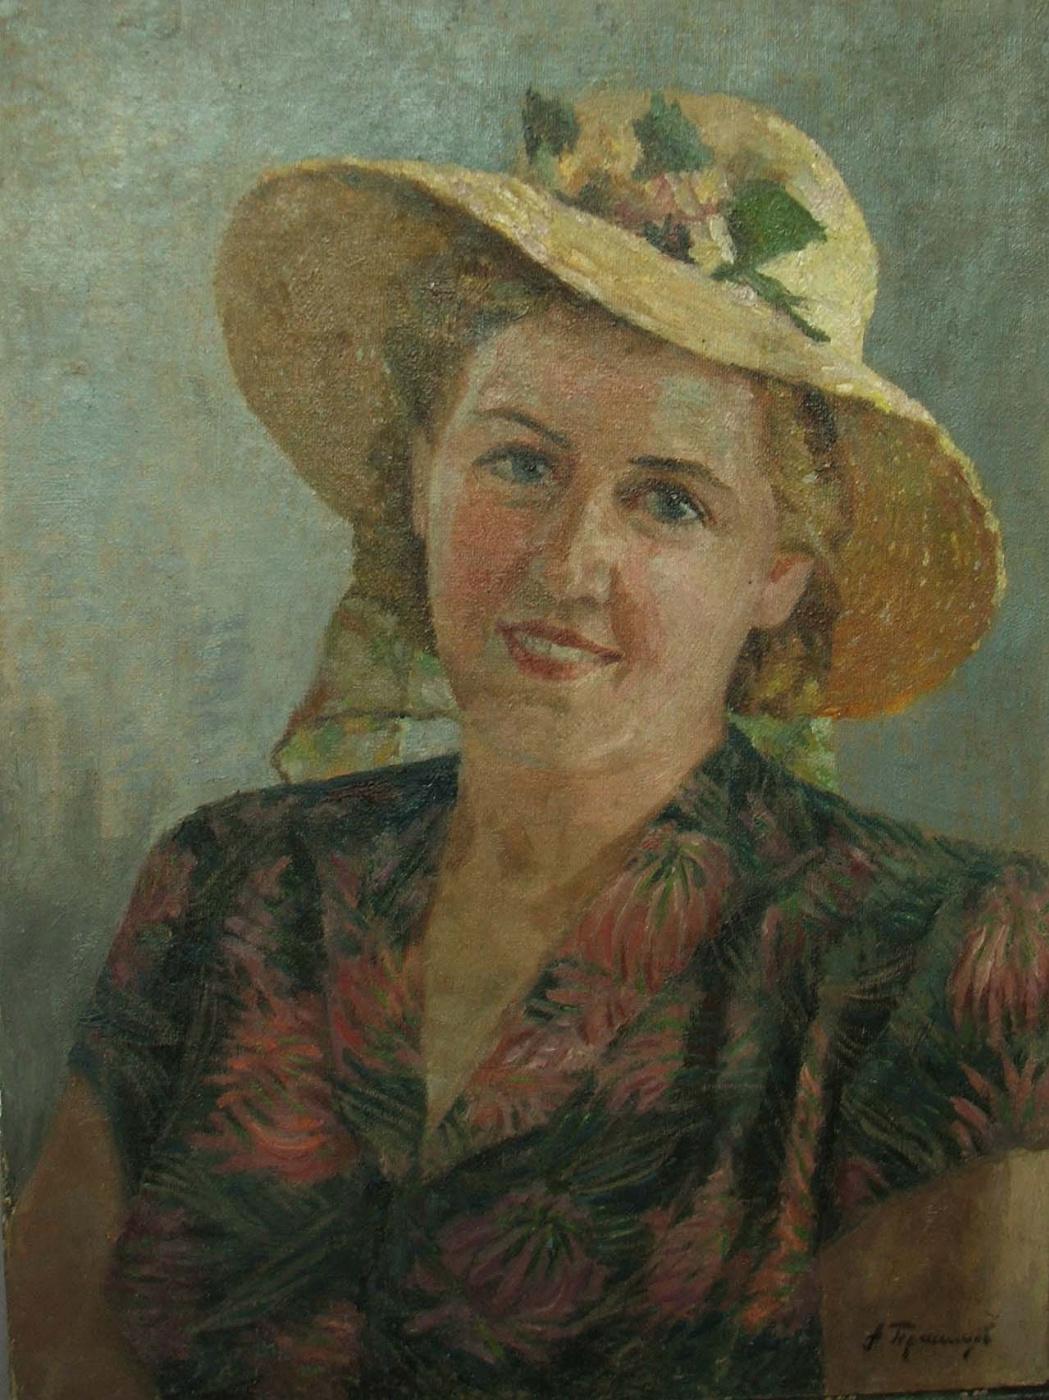 Gerasimov. Portrait of a Woman